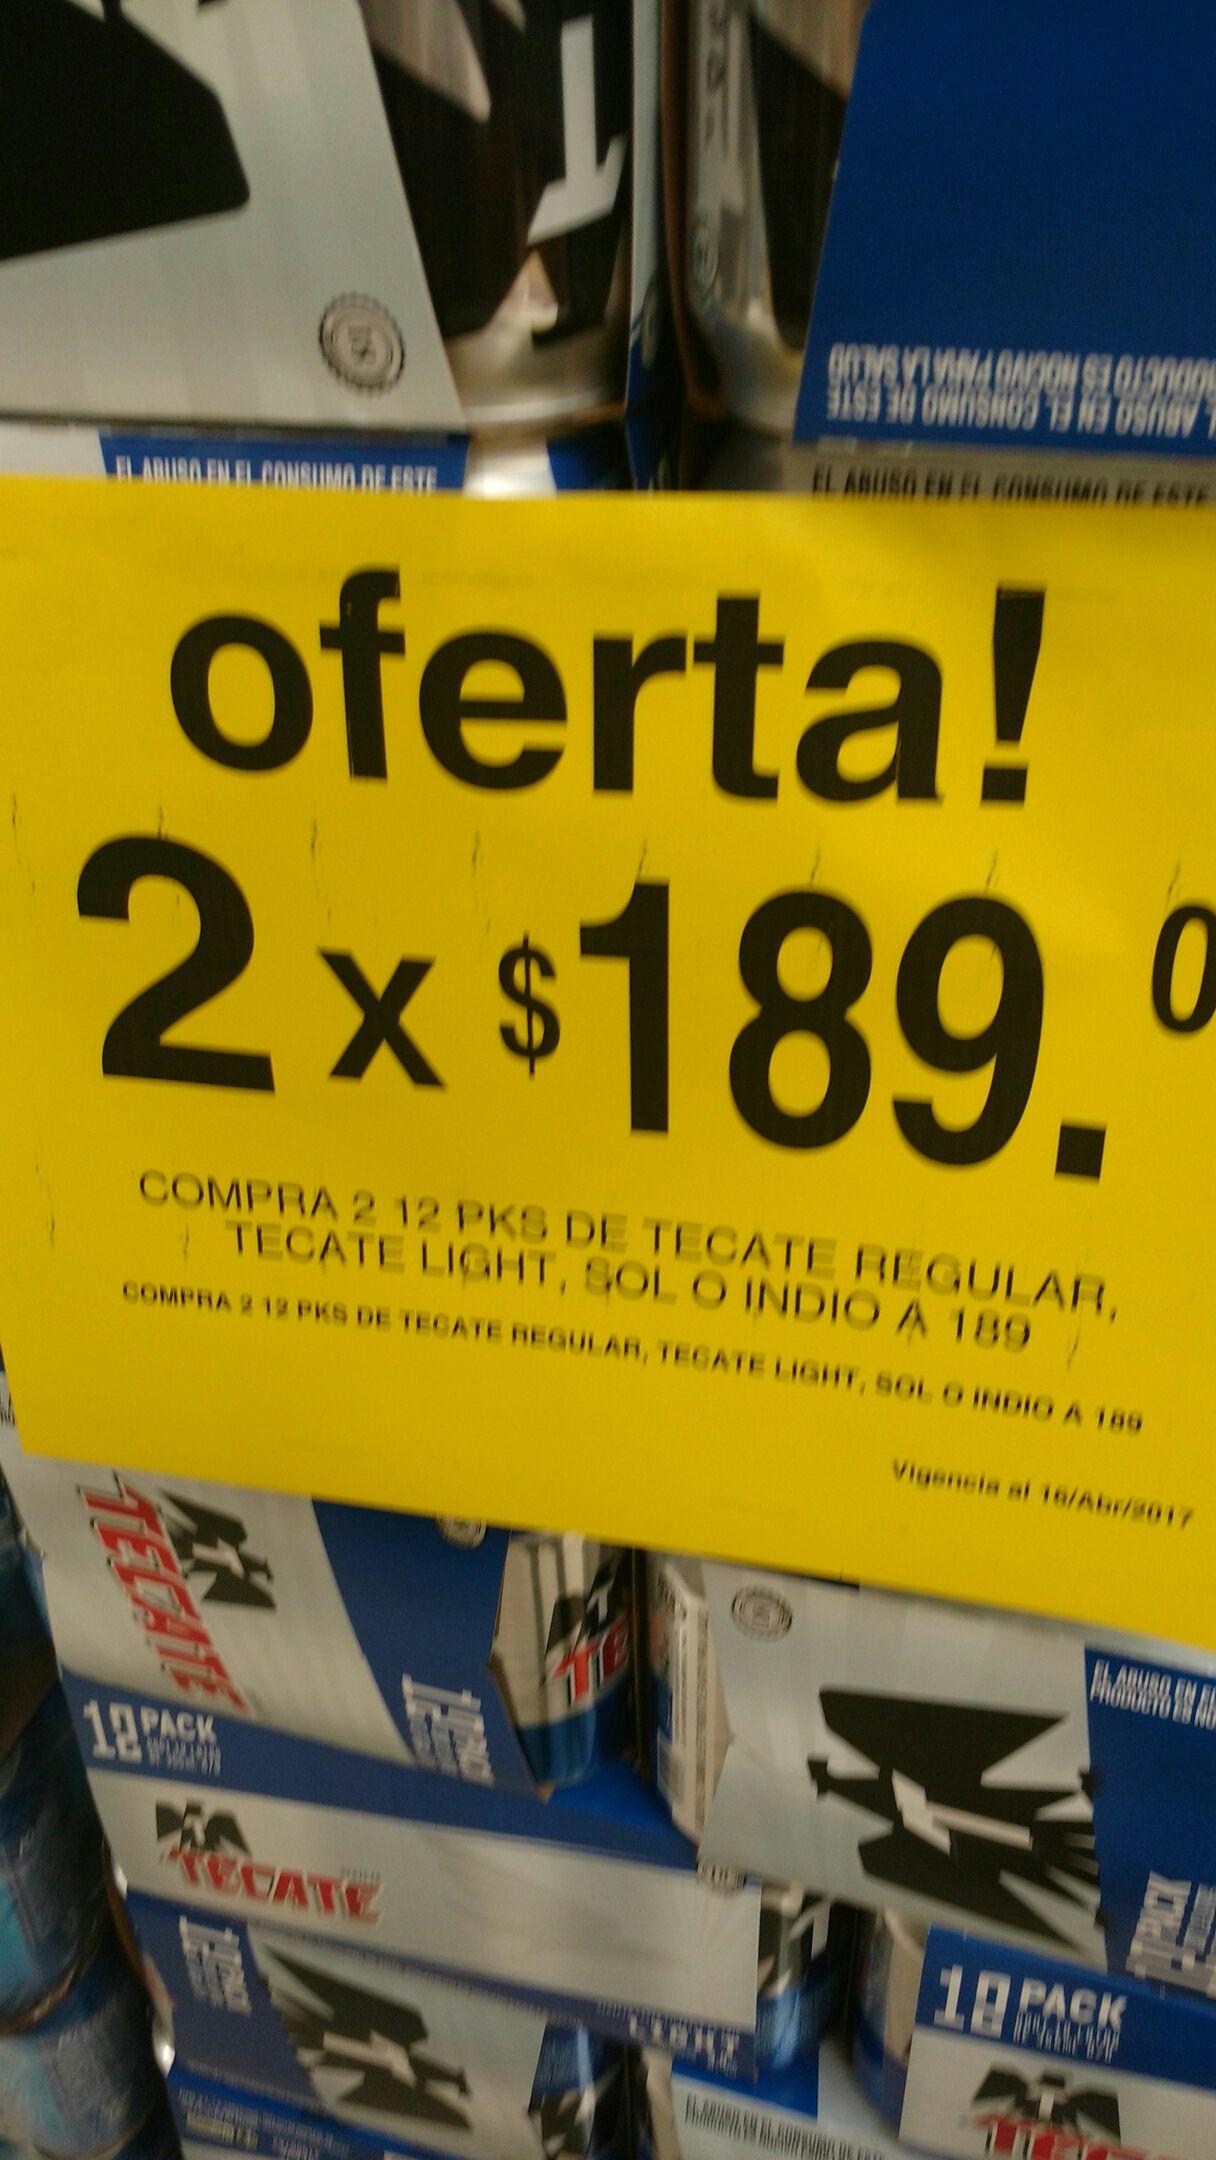 Soriana Hiper Tuxtla: 2 doce pack de Tecate, indio o sol $189